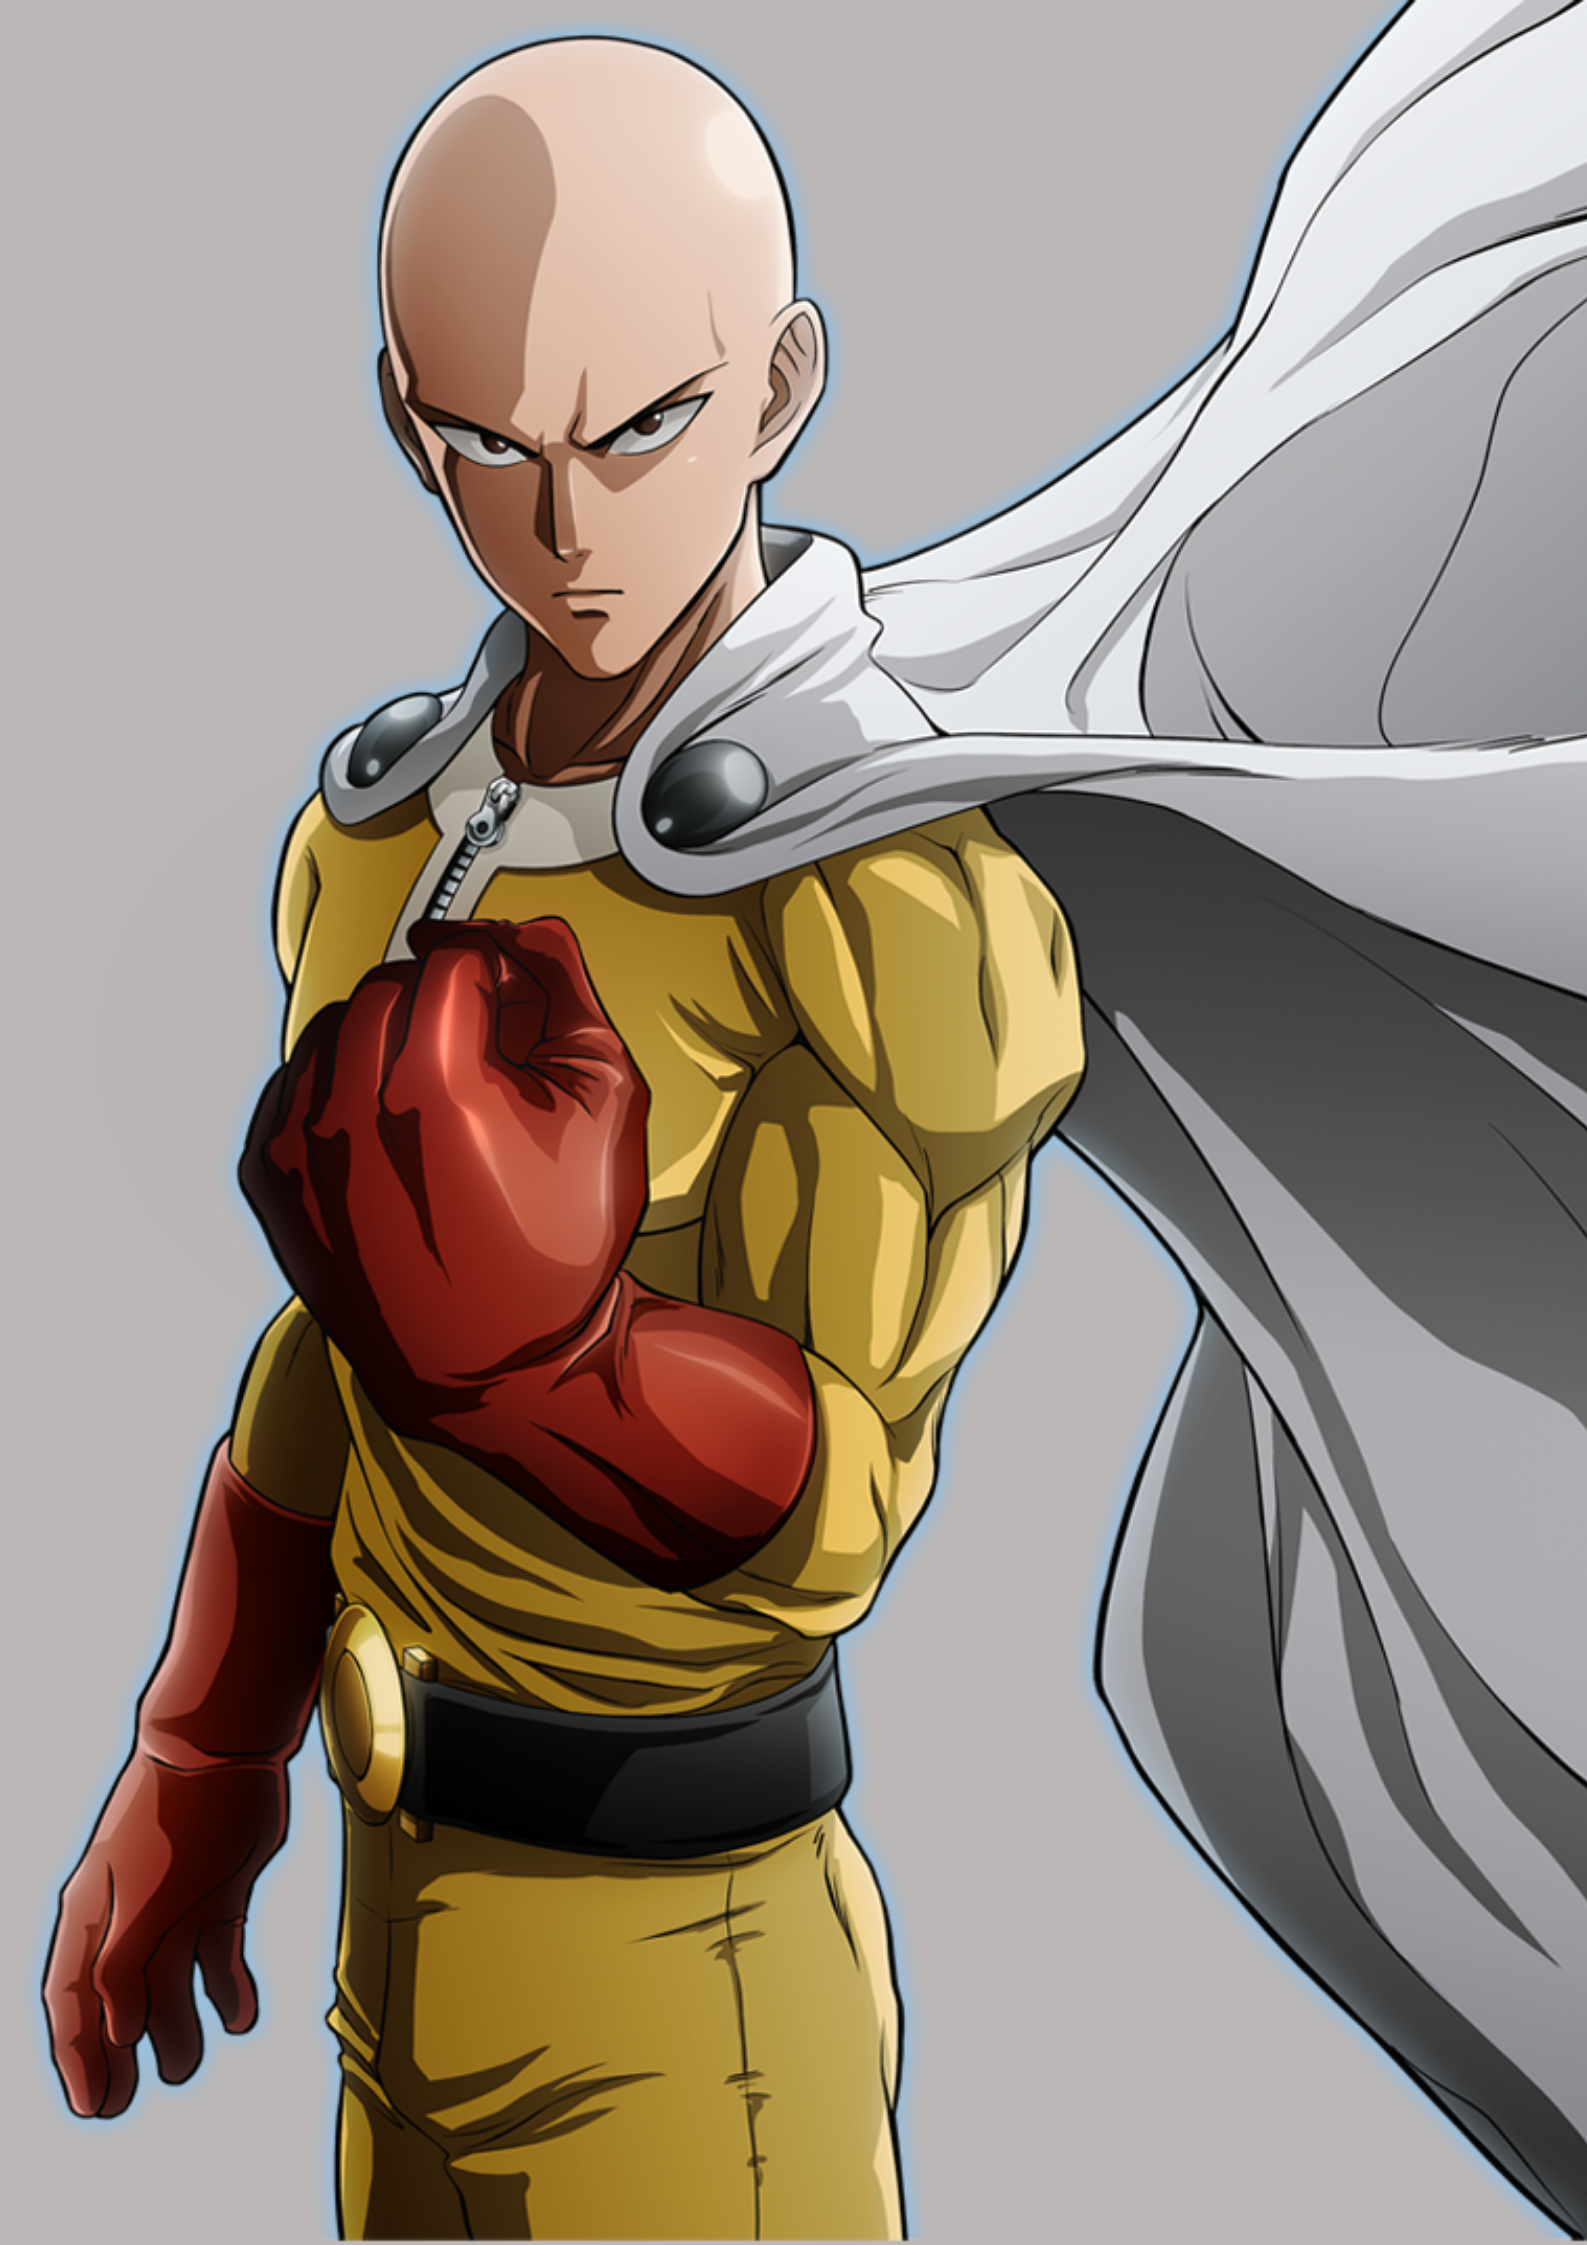 Why Is Saitama So Powerful Secret Revealed One Punch Man One Punch Man Anime One Punch Man Manga One Punch Man